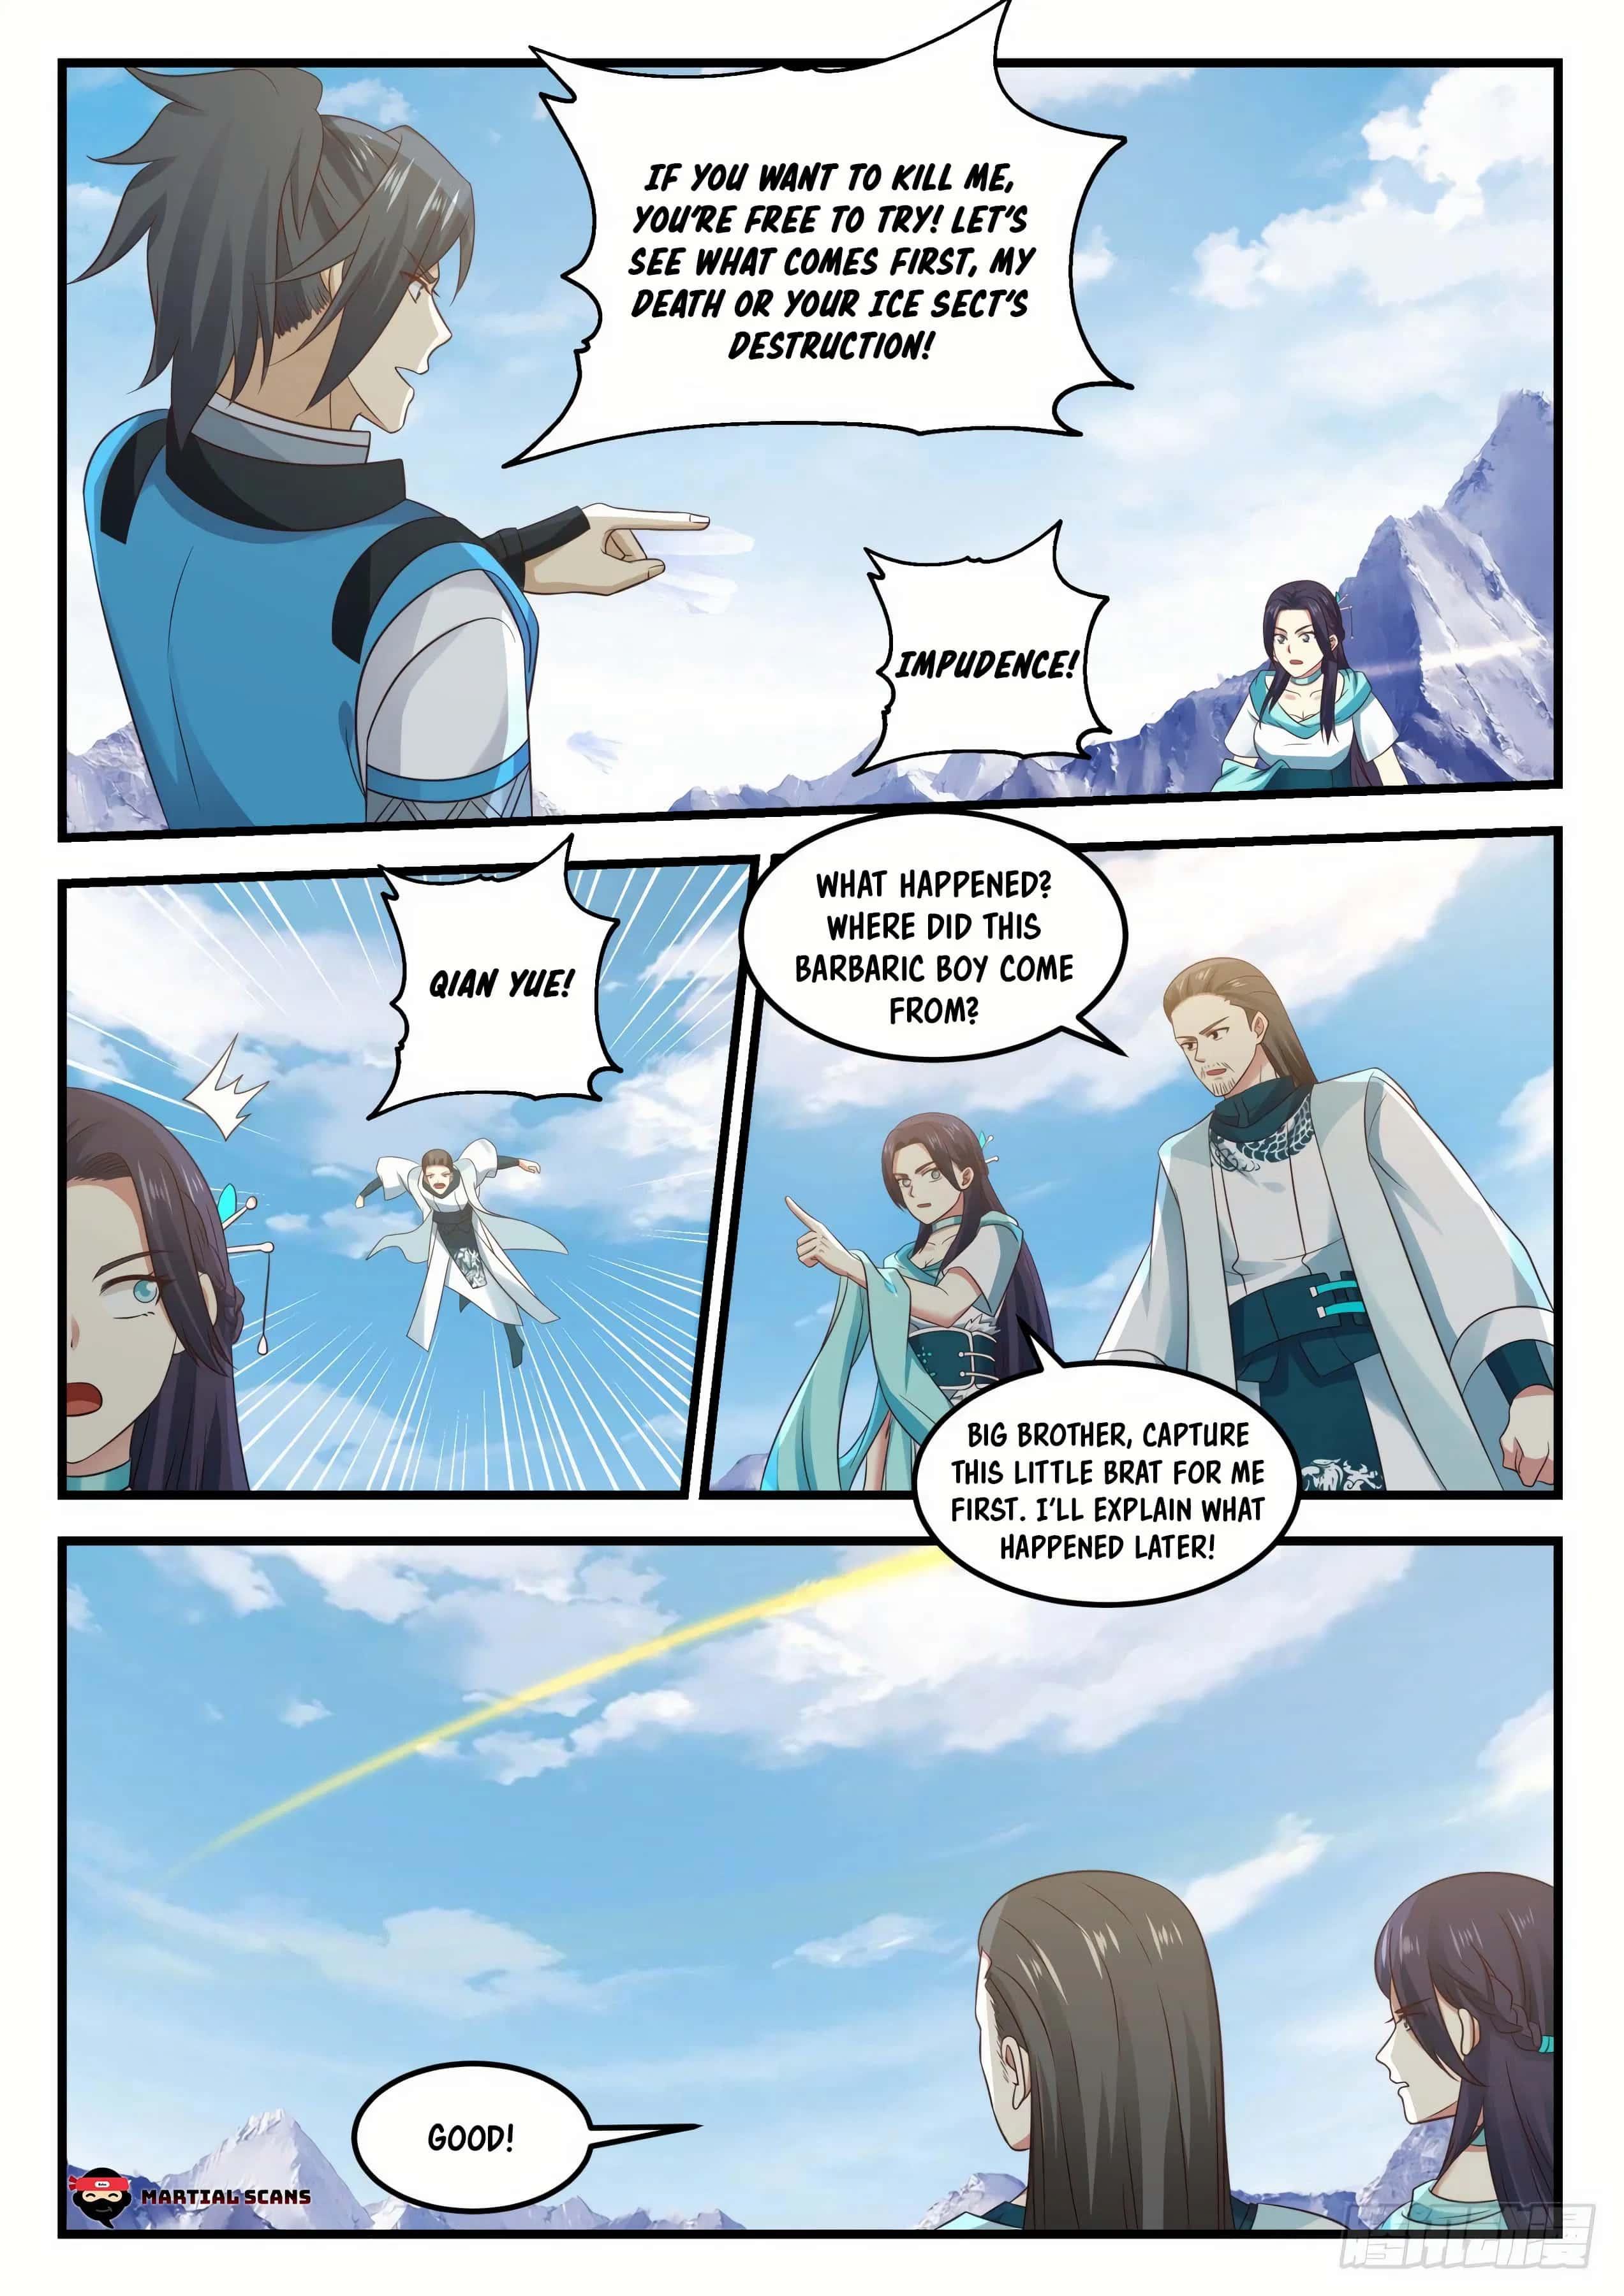 Martial Peak - chapter 694-eng-li